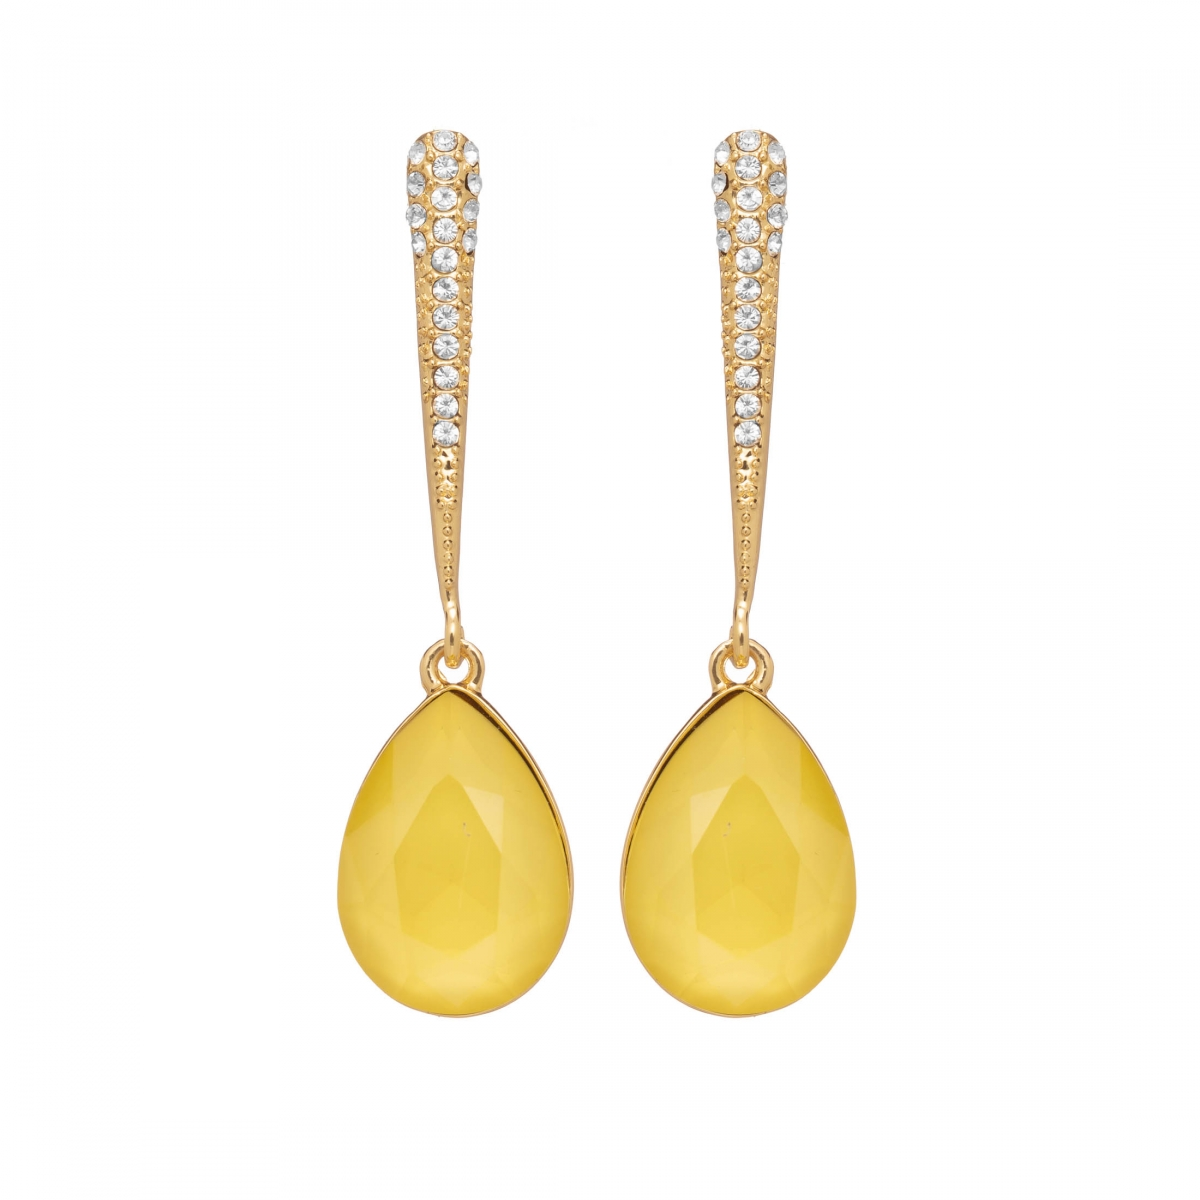 Náušnice Lilja Exclusive Elegance Yellow Dropp Crystals Gold